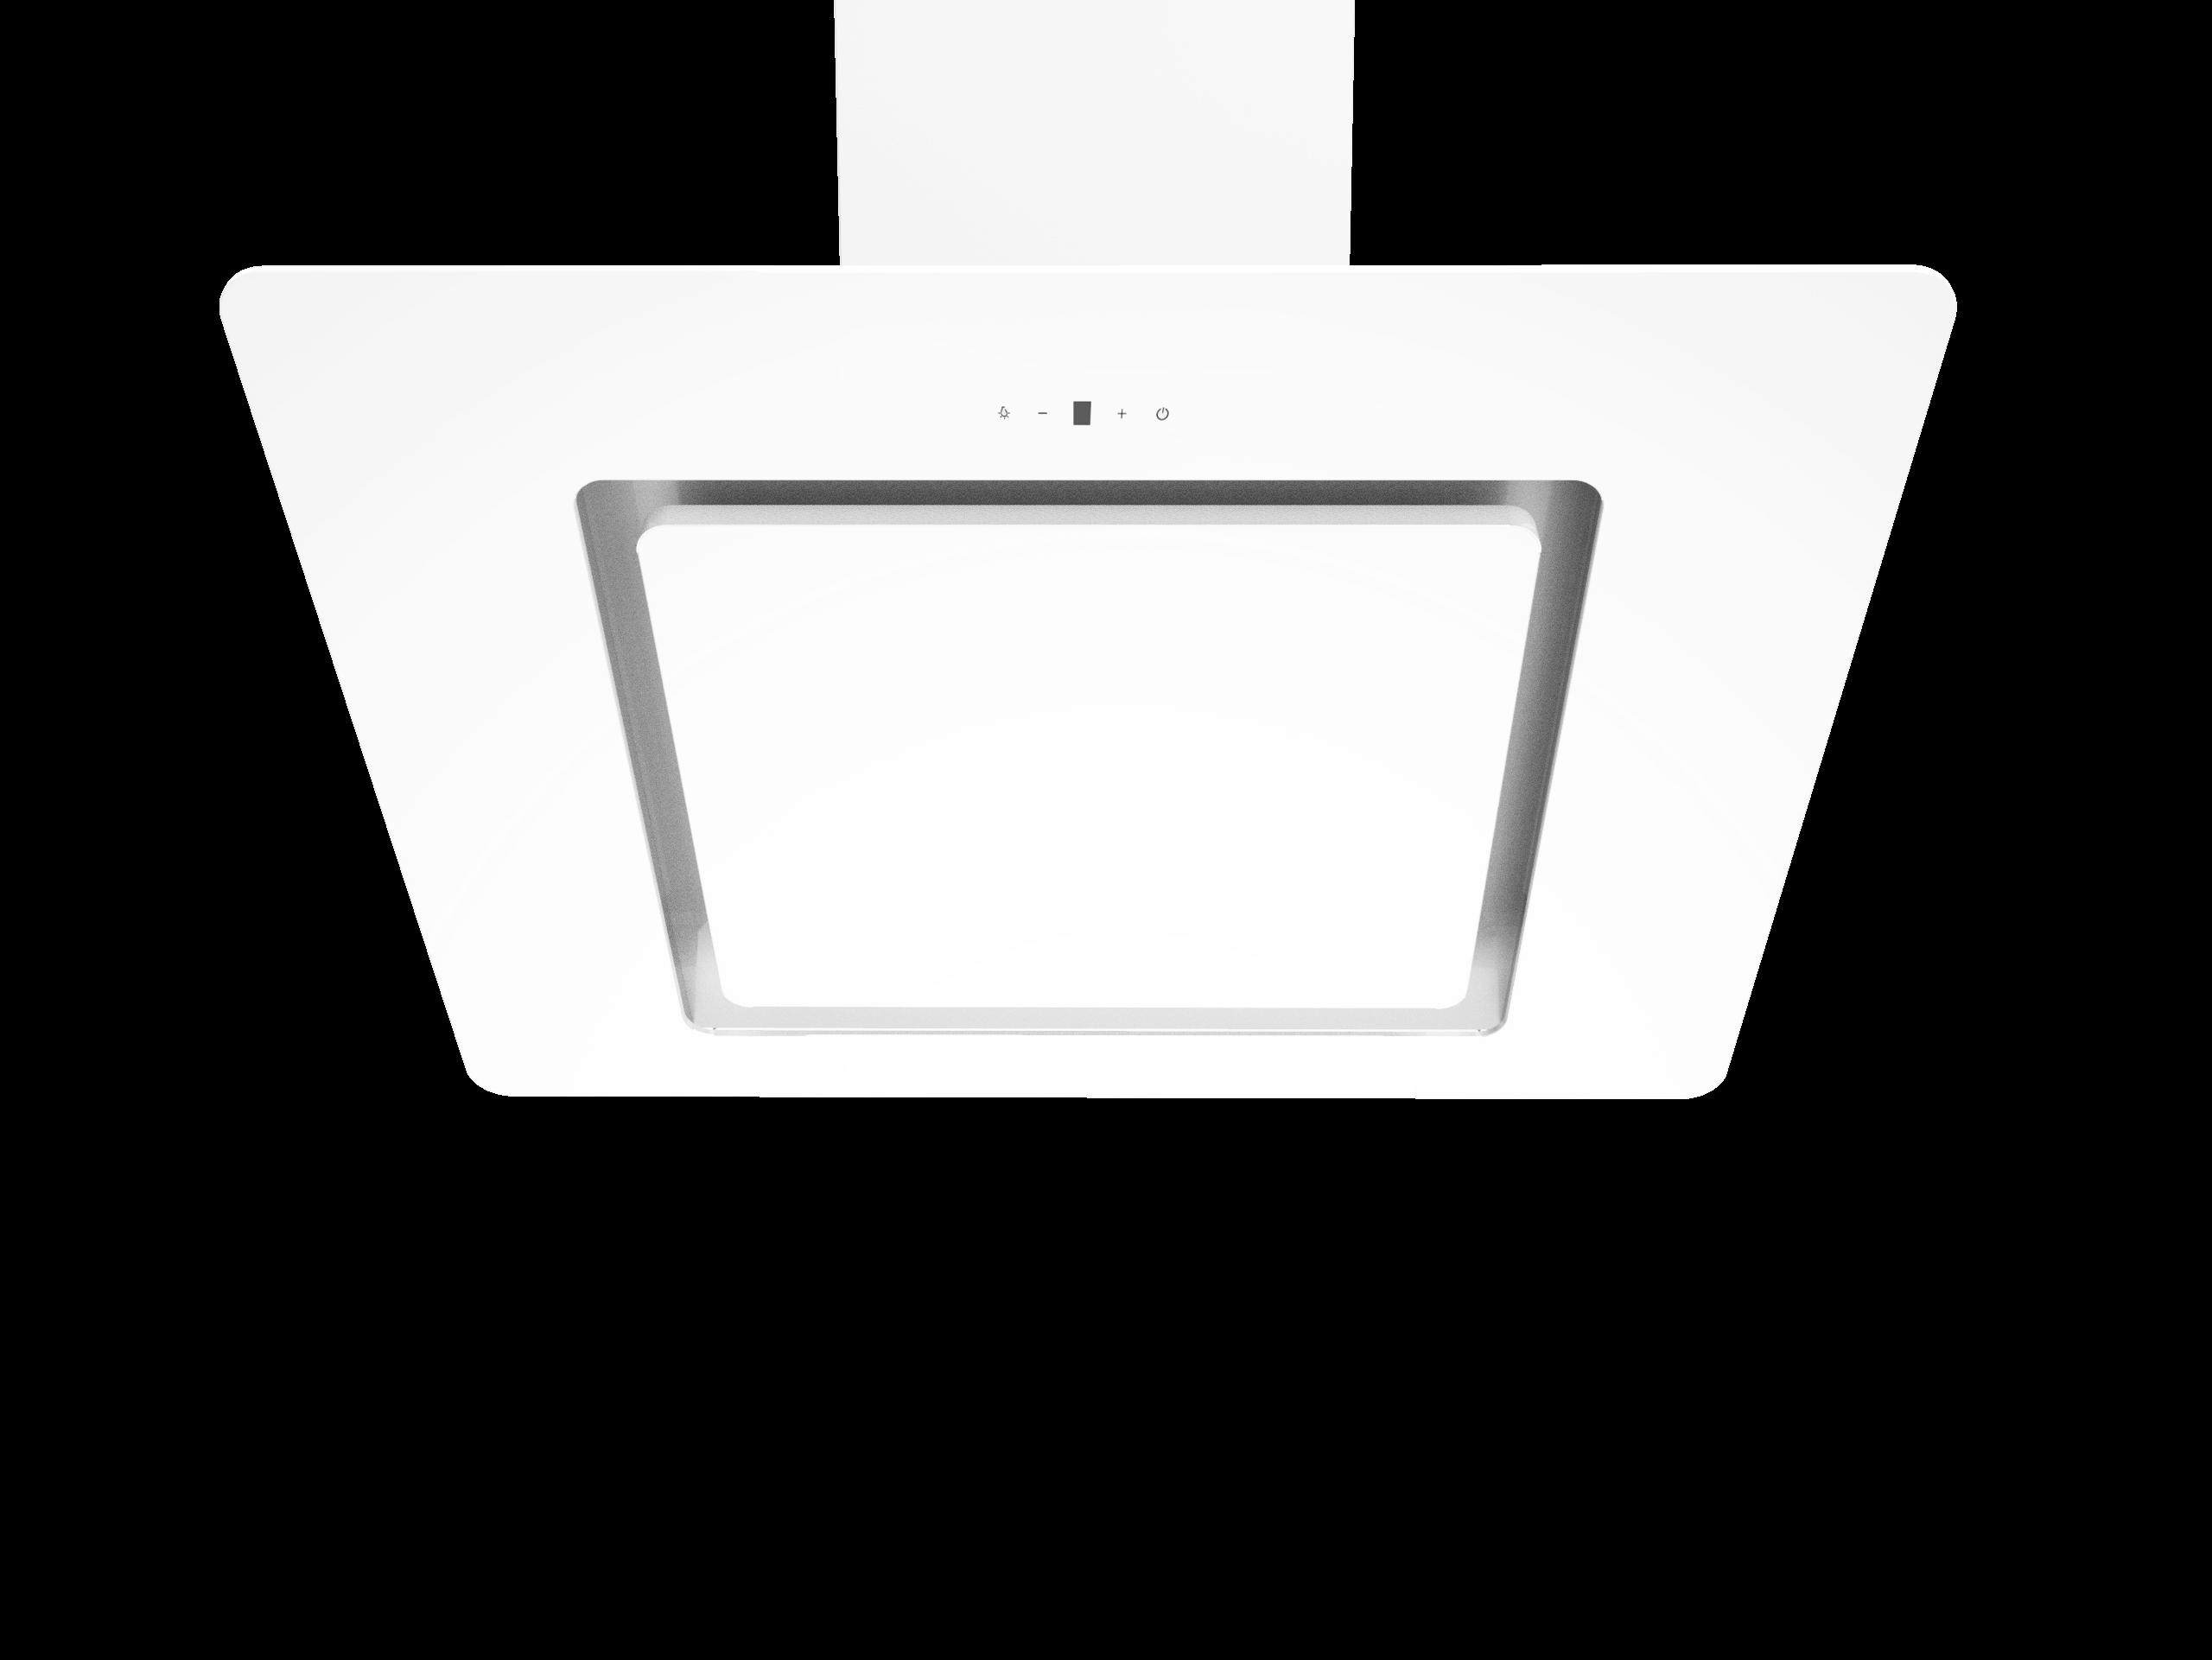 Вытяжка кухонная Midea MH60AN350GW